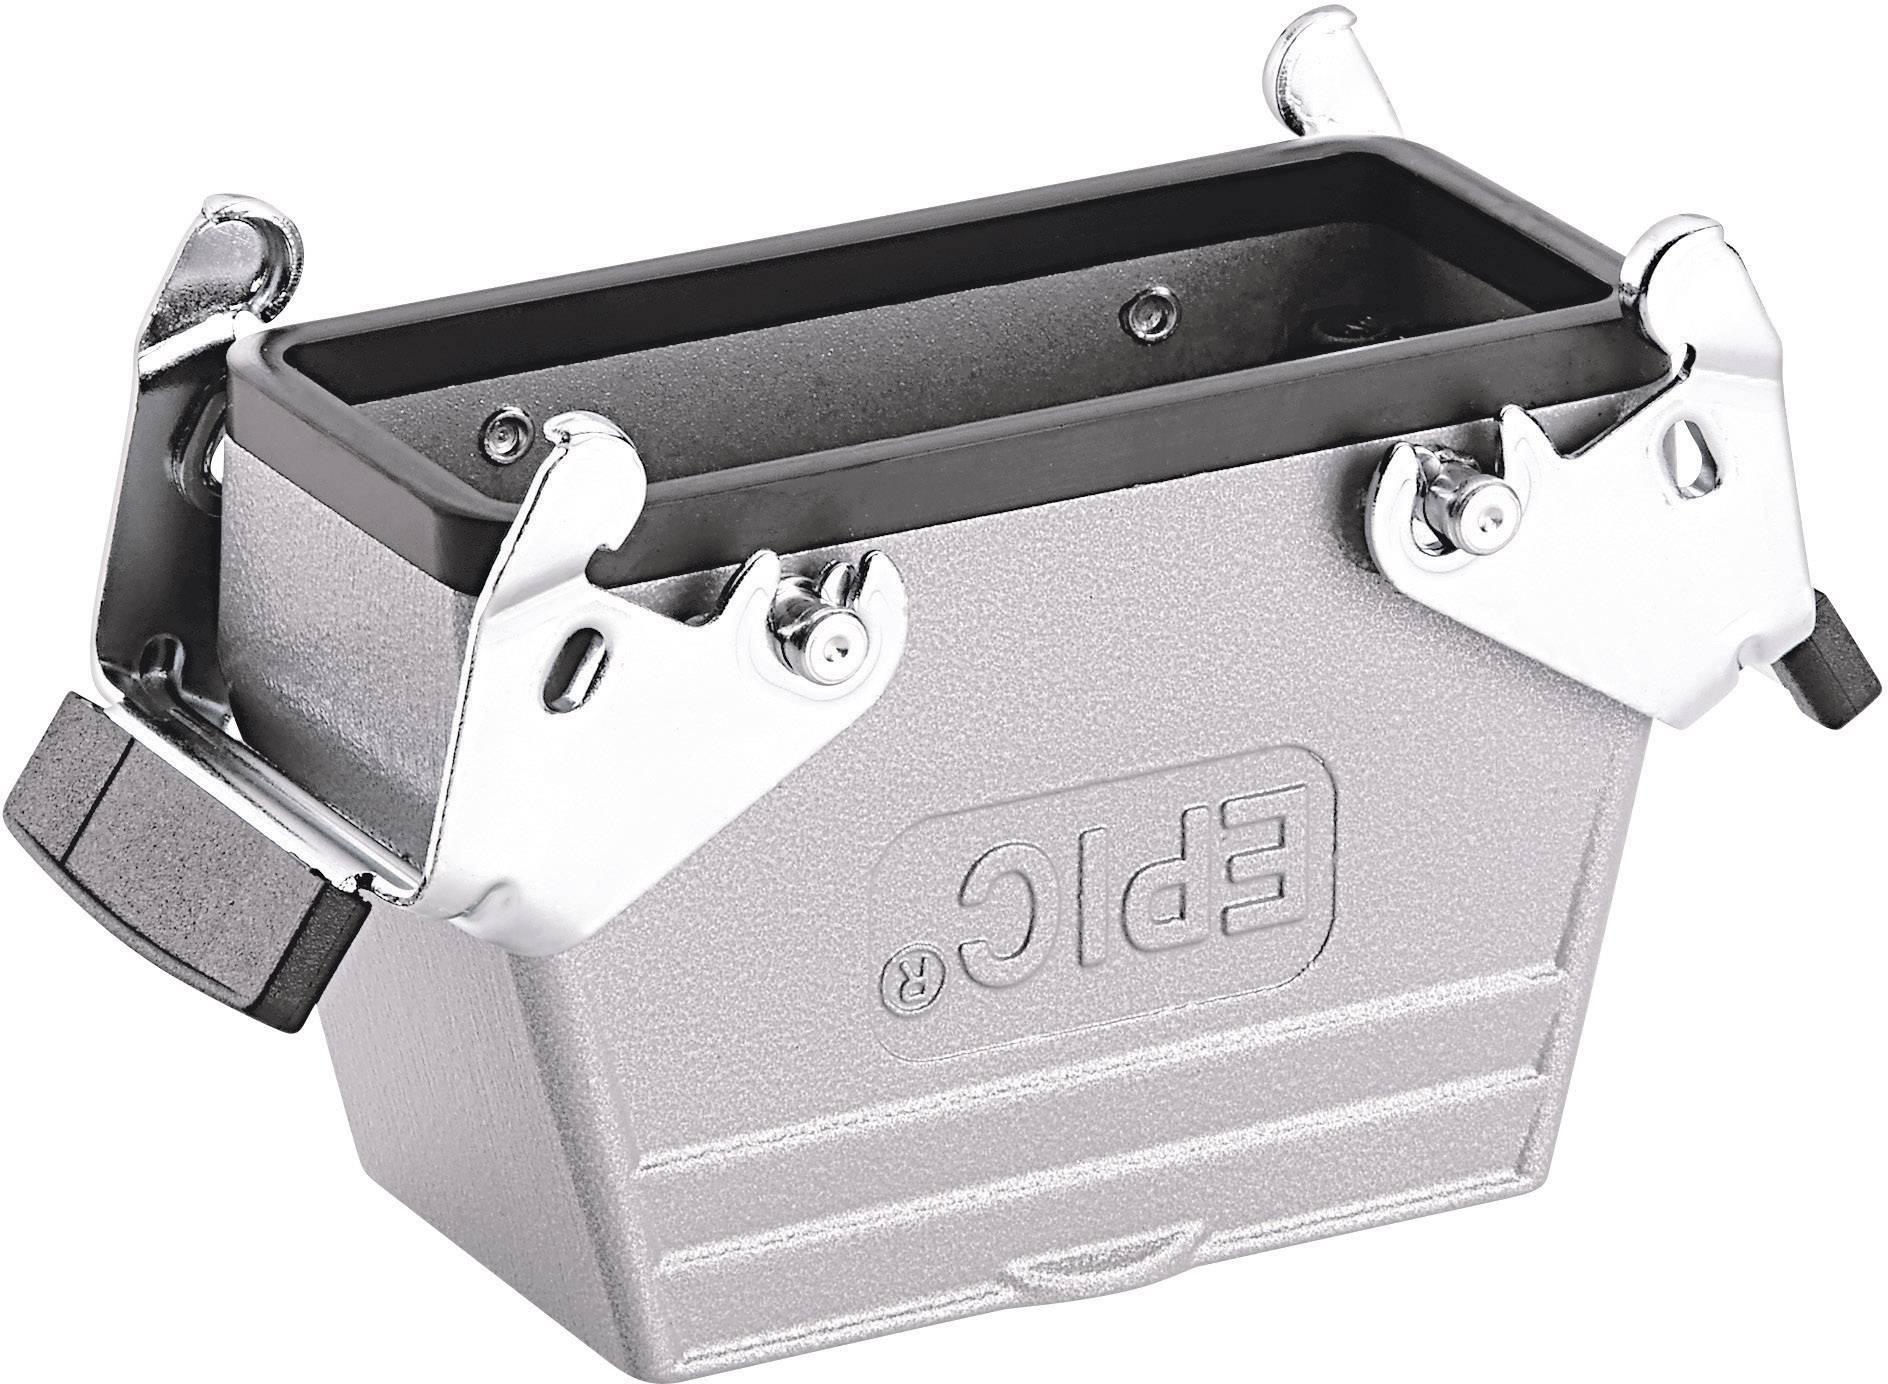 LappKabel EPIC® H-B 10 TBF M25 (79040200), IP65, šedá